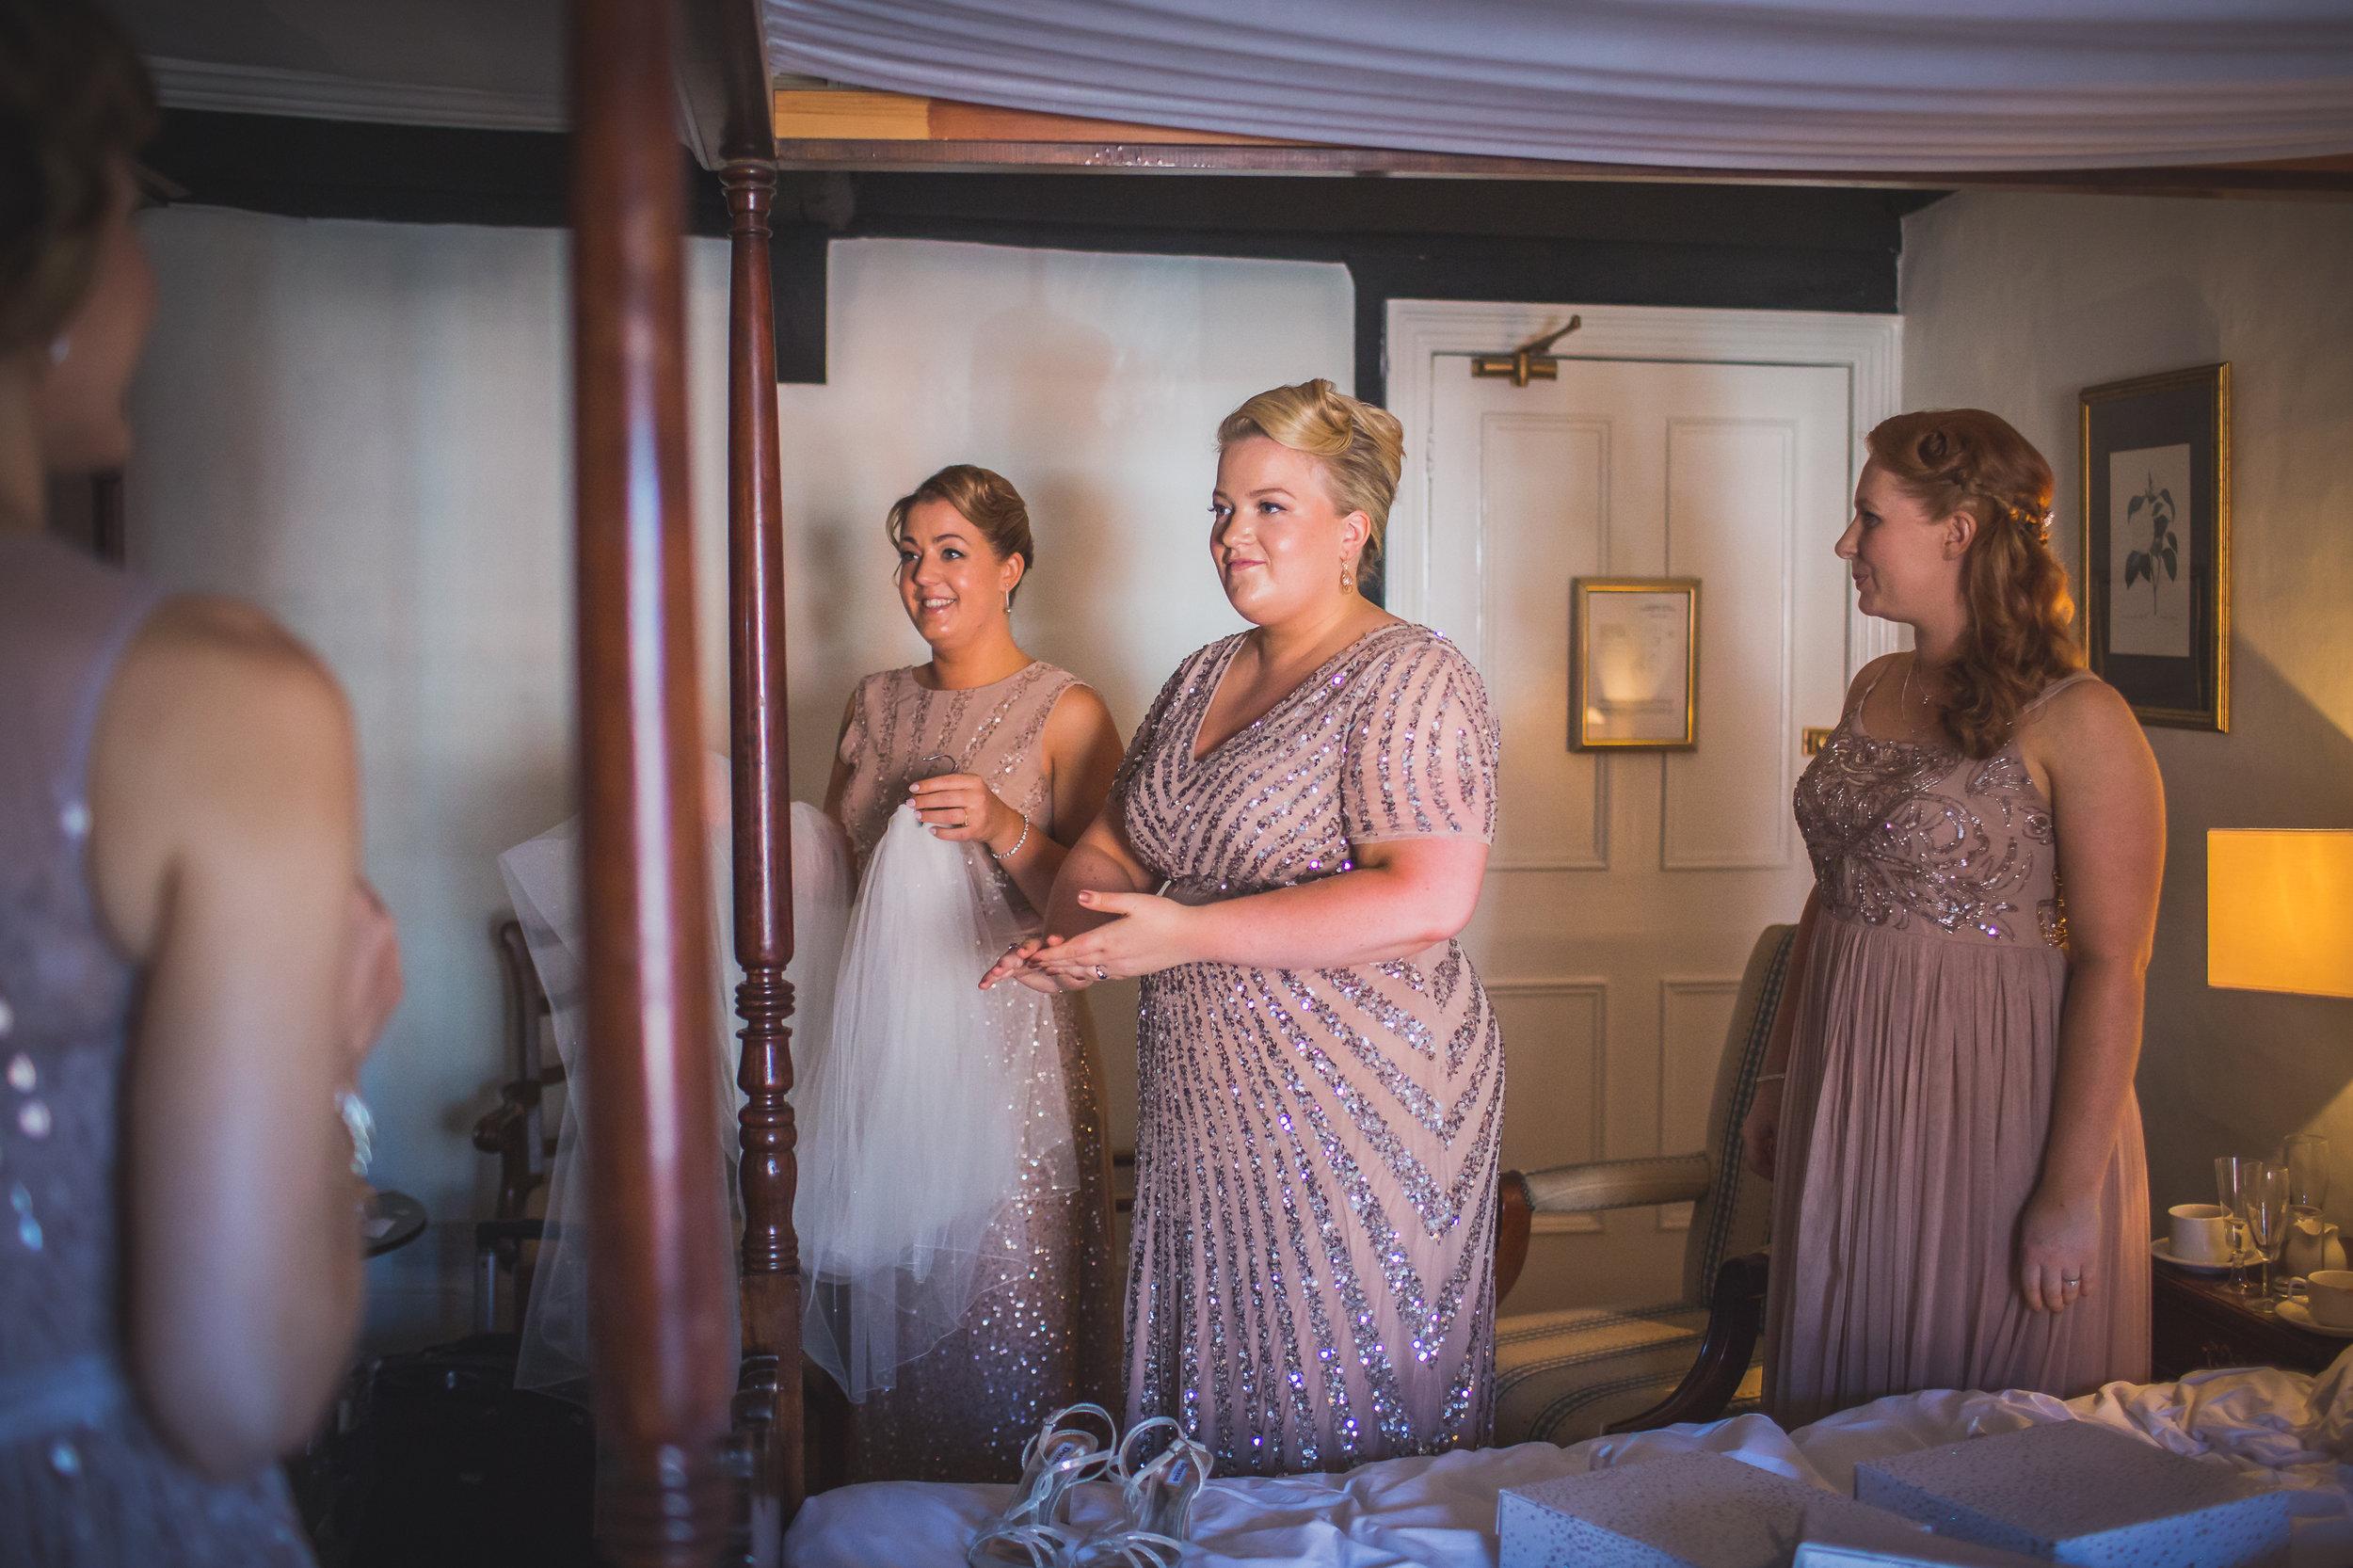 Grittenham Barn female wedding photographers west sussex petworth social-3.jpg